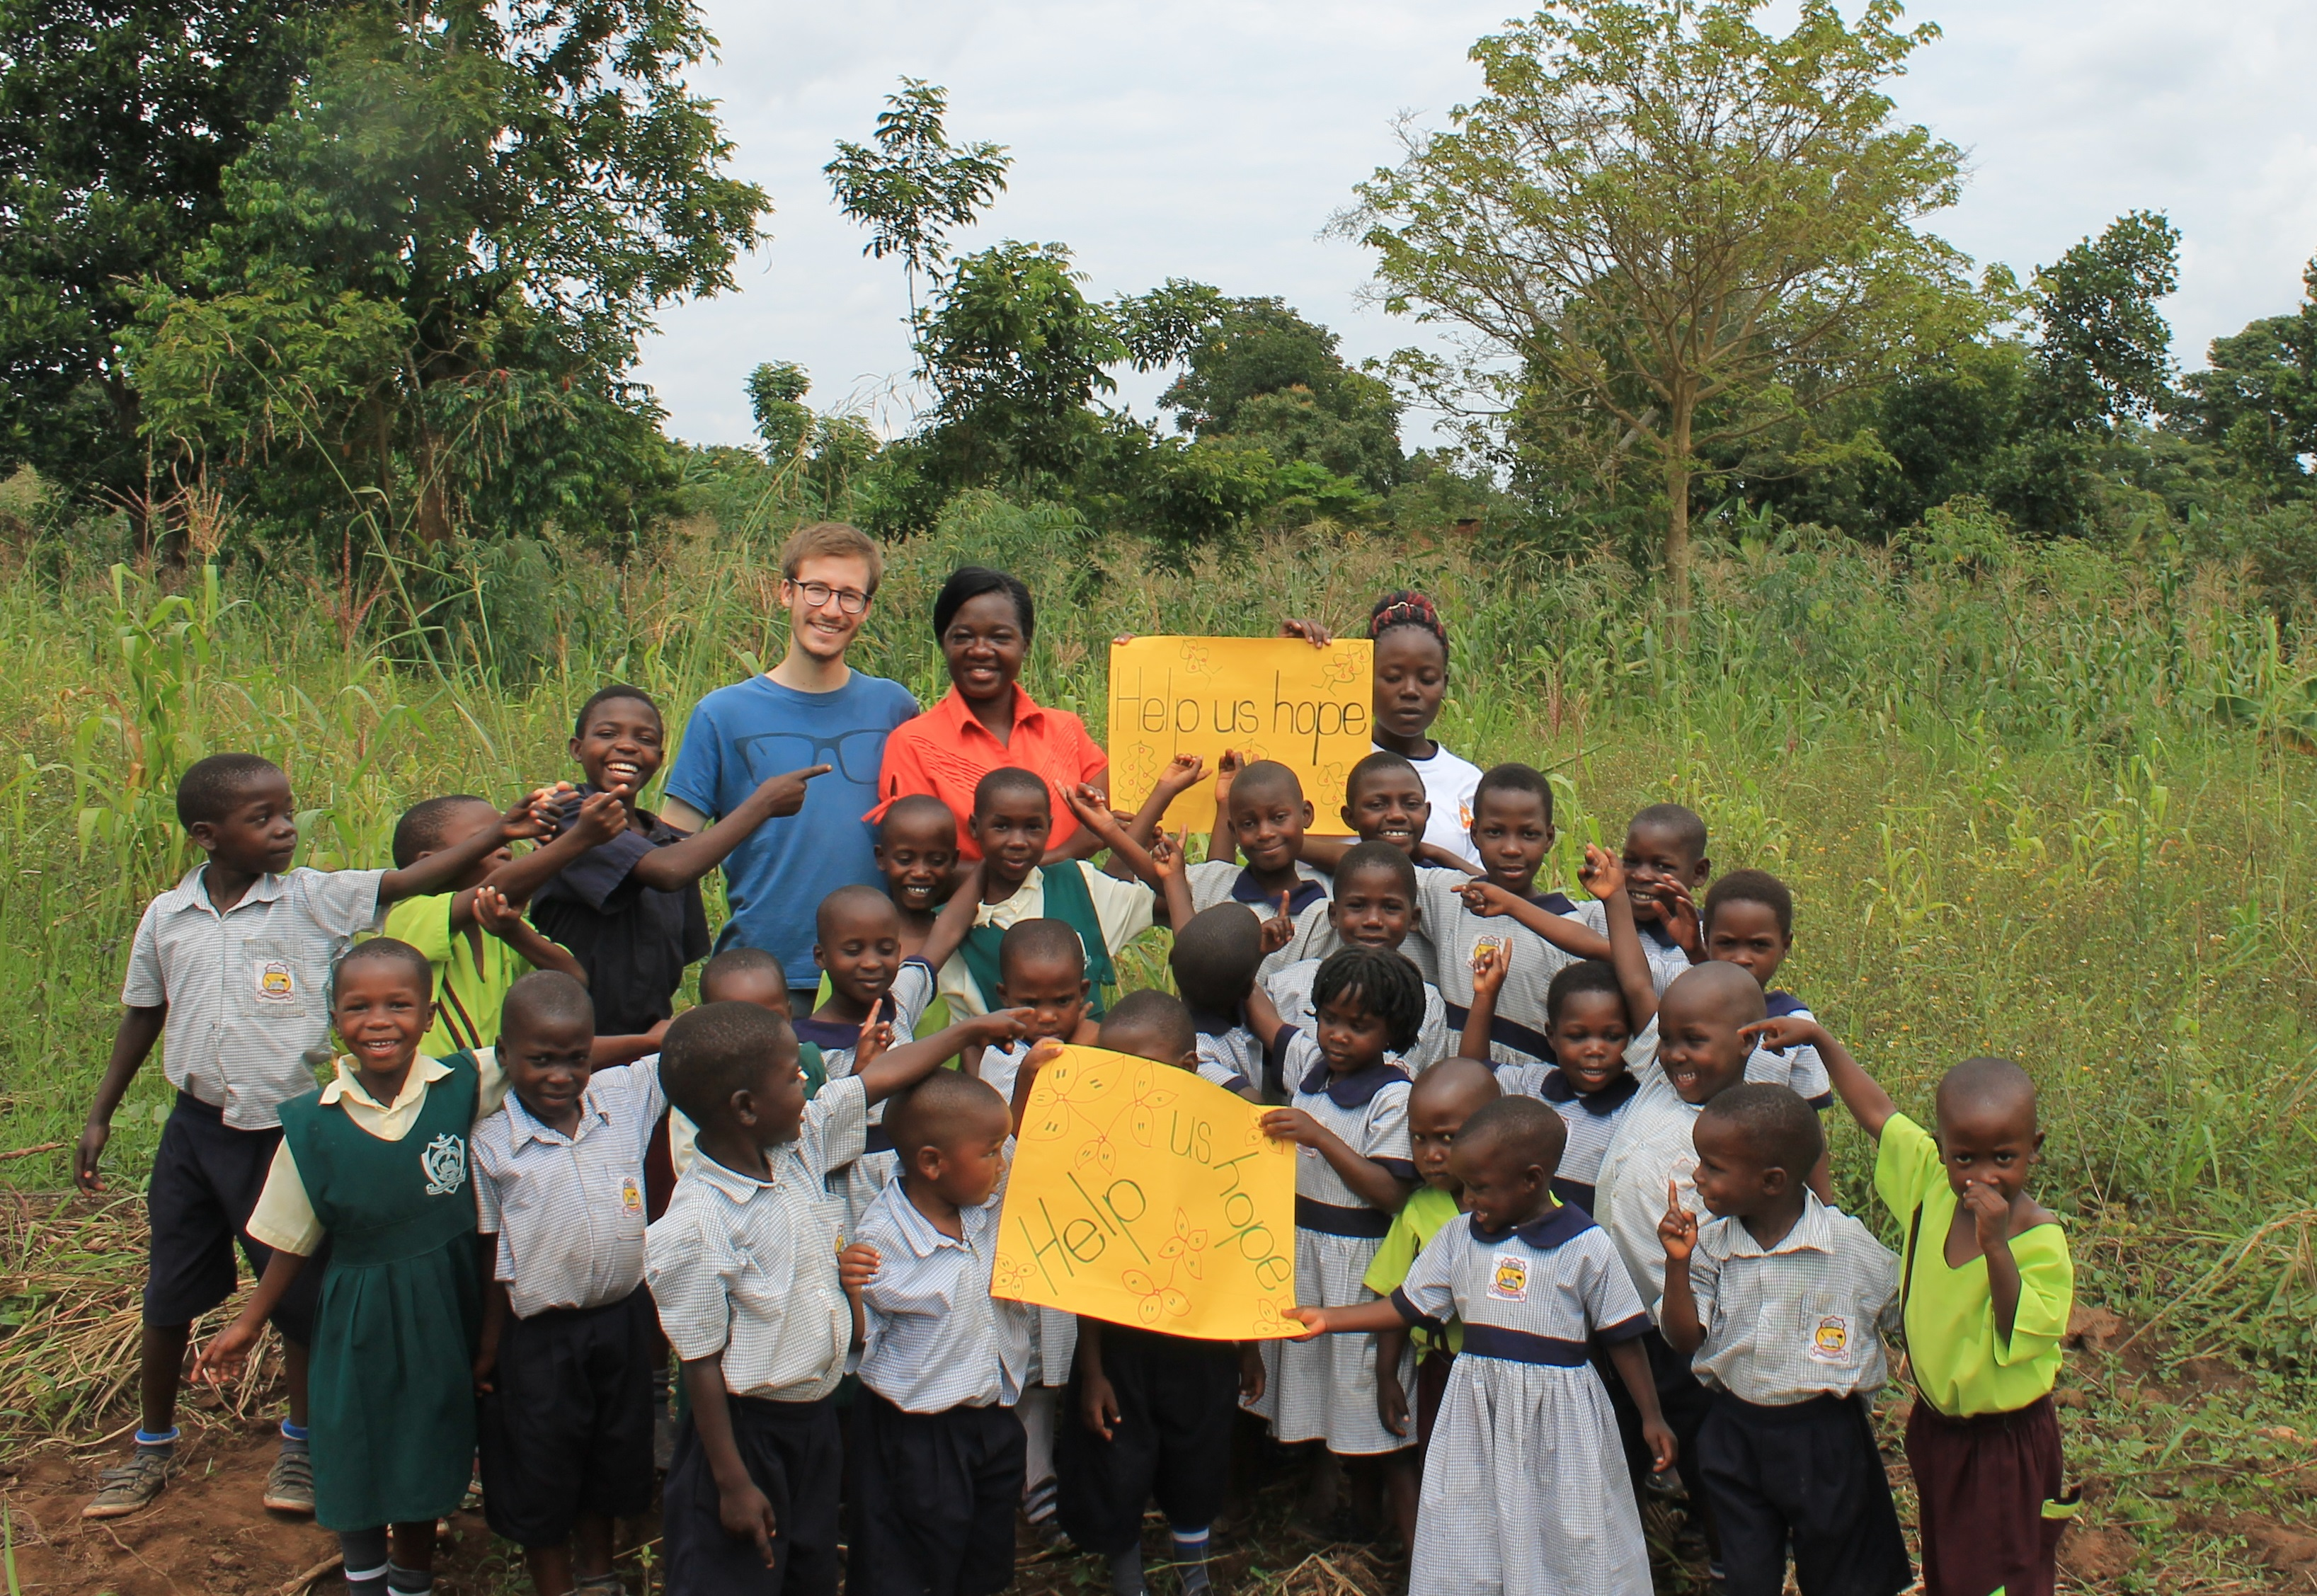 Social Impact in Uganda: Teaching at the Primary School in